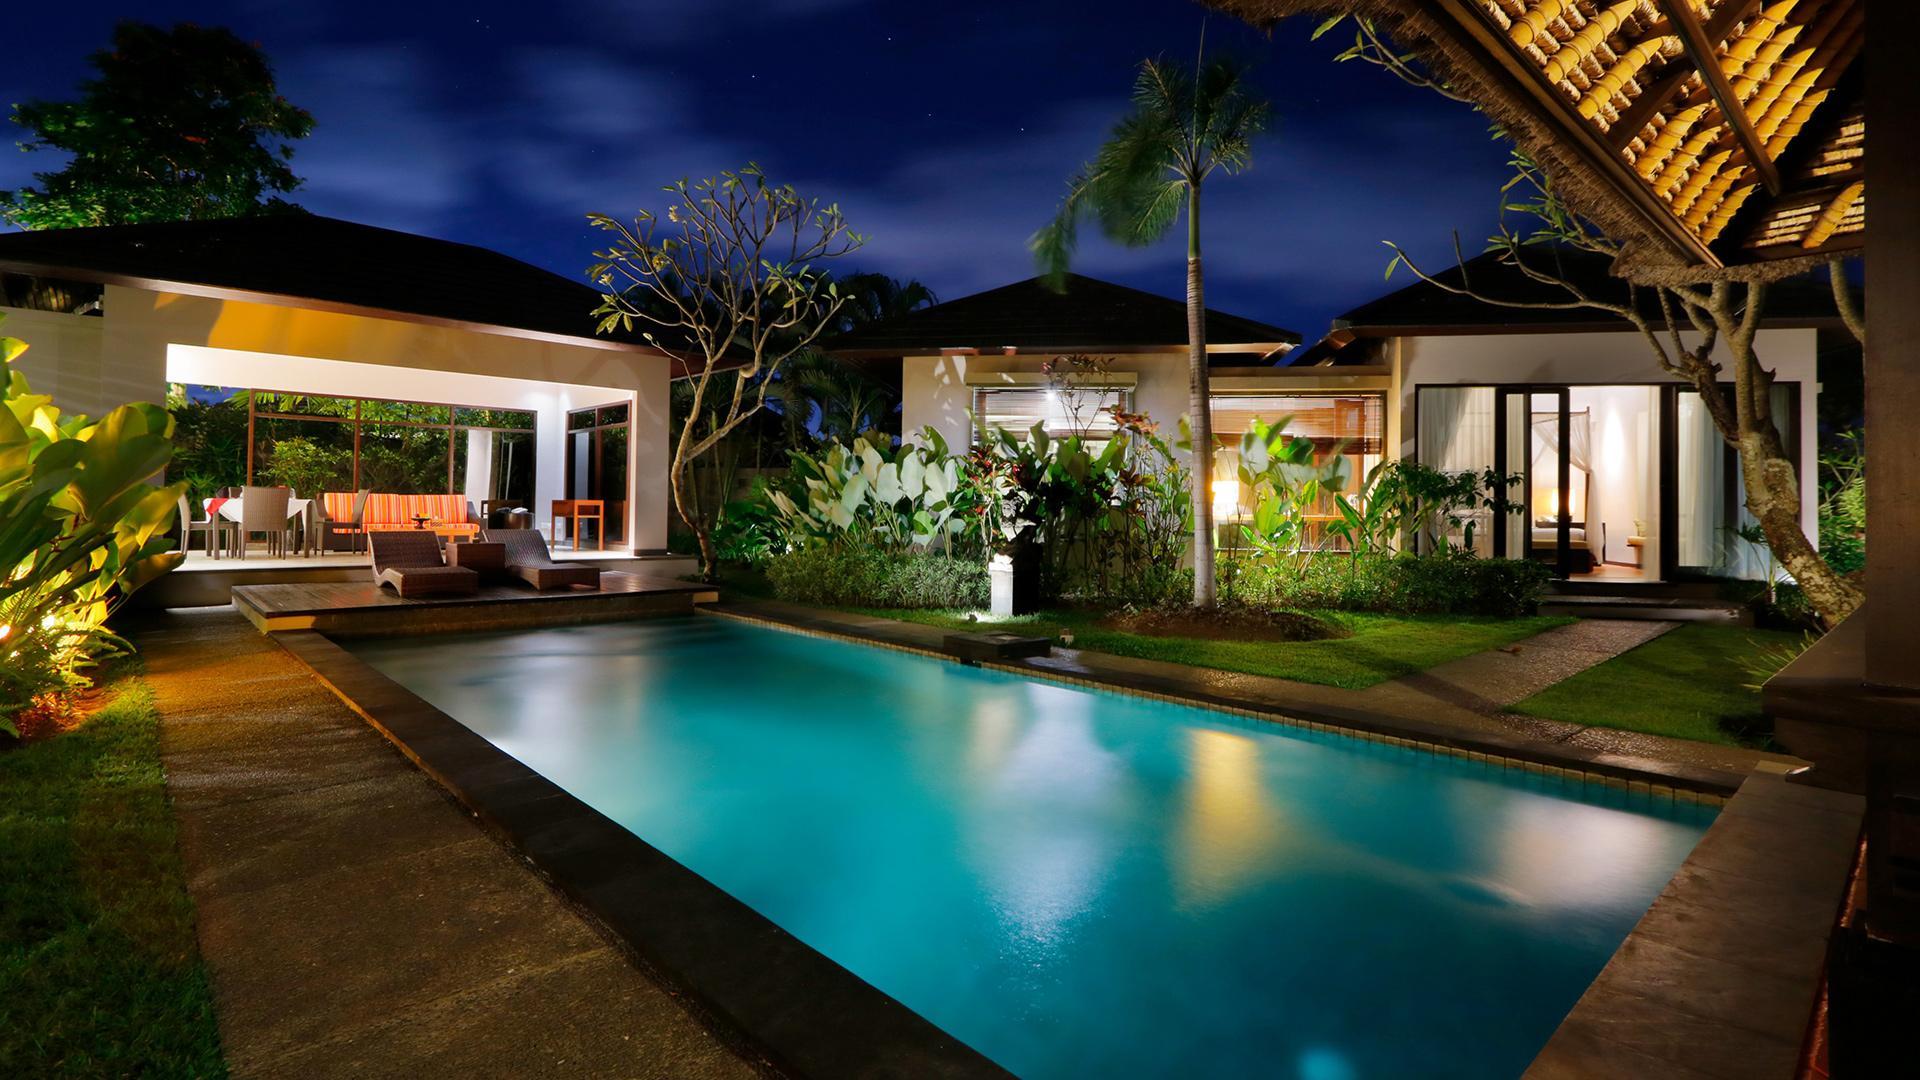 Two Bedroom Pool Villa image 1 at Park Hotel Nusa Dua Villas by Kabupaten Badung, Bali, Indonesia